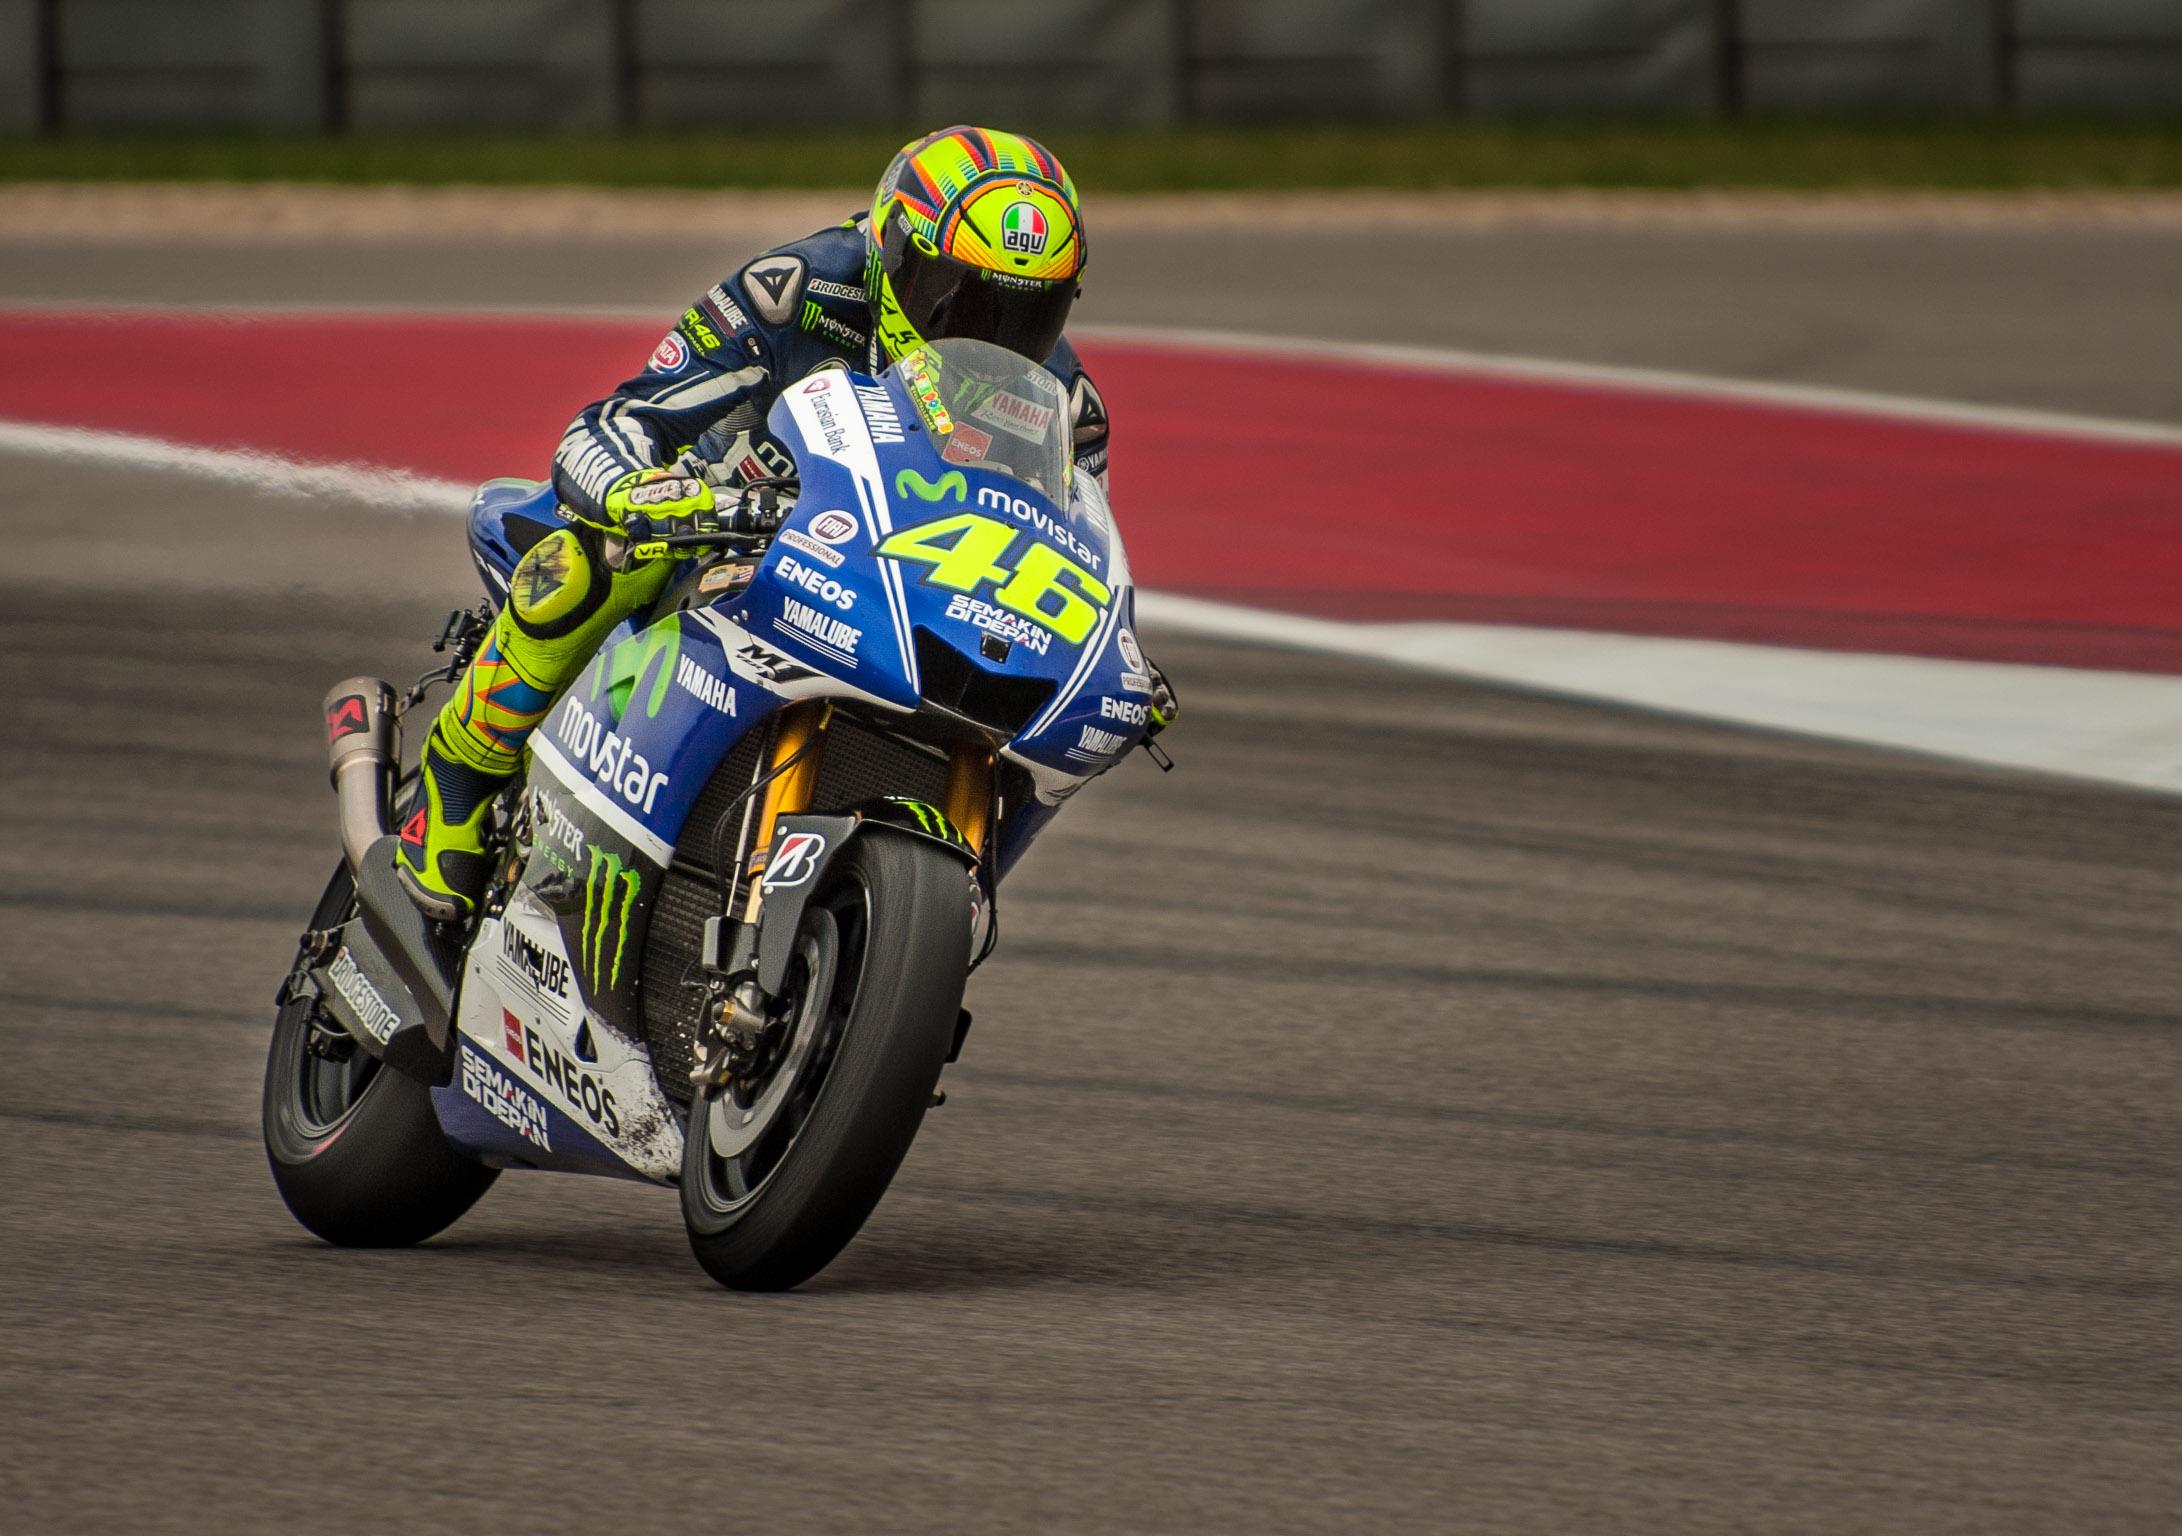 Valentino Rossi, Movistar Yamaha | Dave Wilson Photography